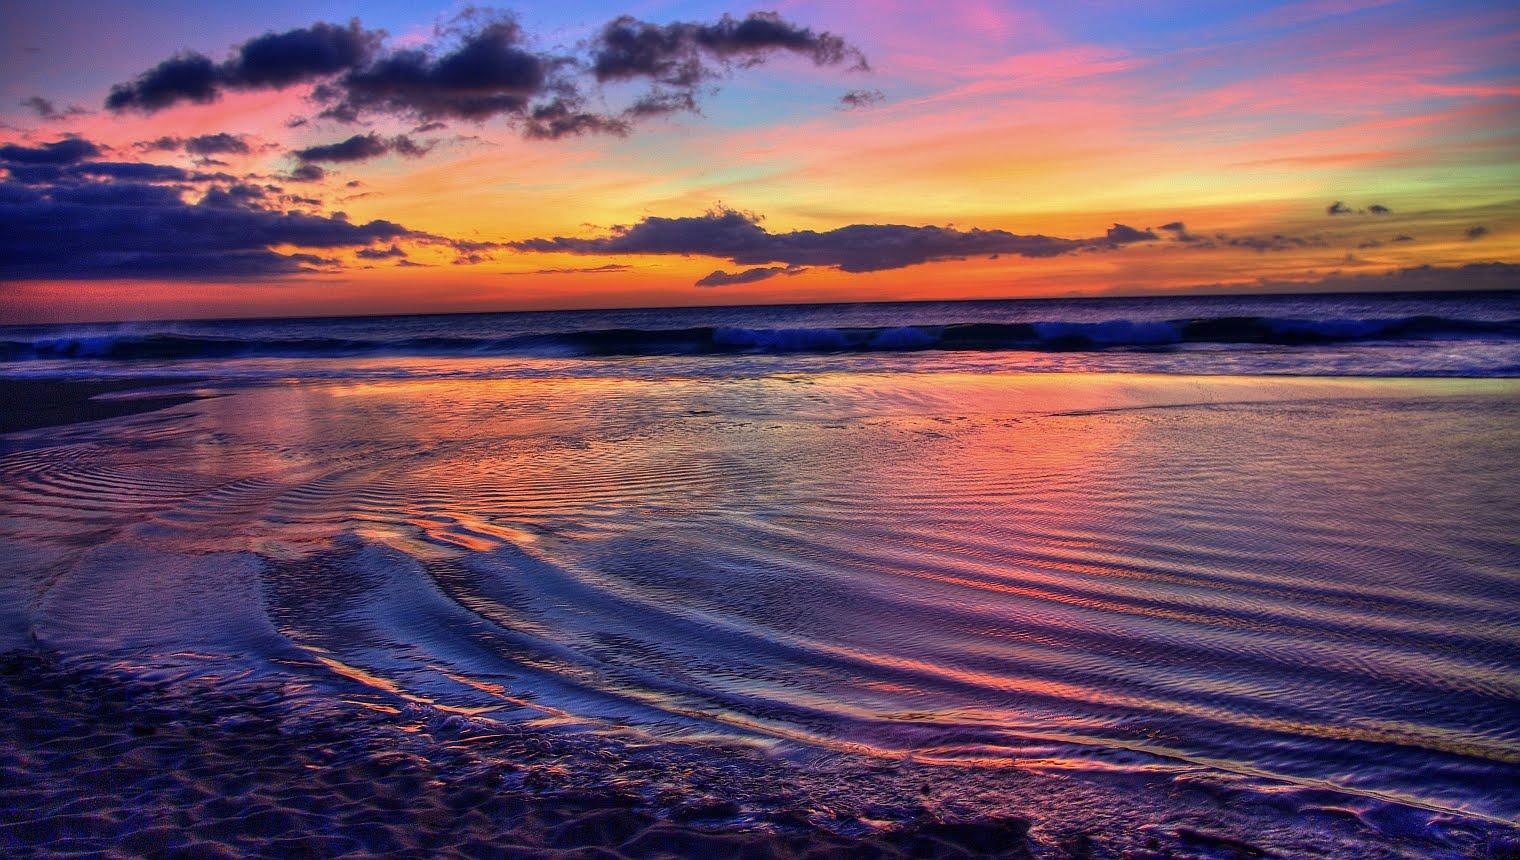 Daniel Herr Hawaiian Sunset Wallpaper 1520x860